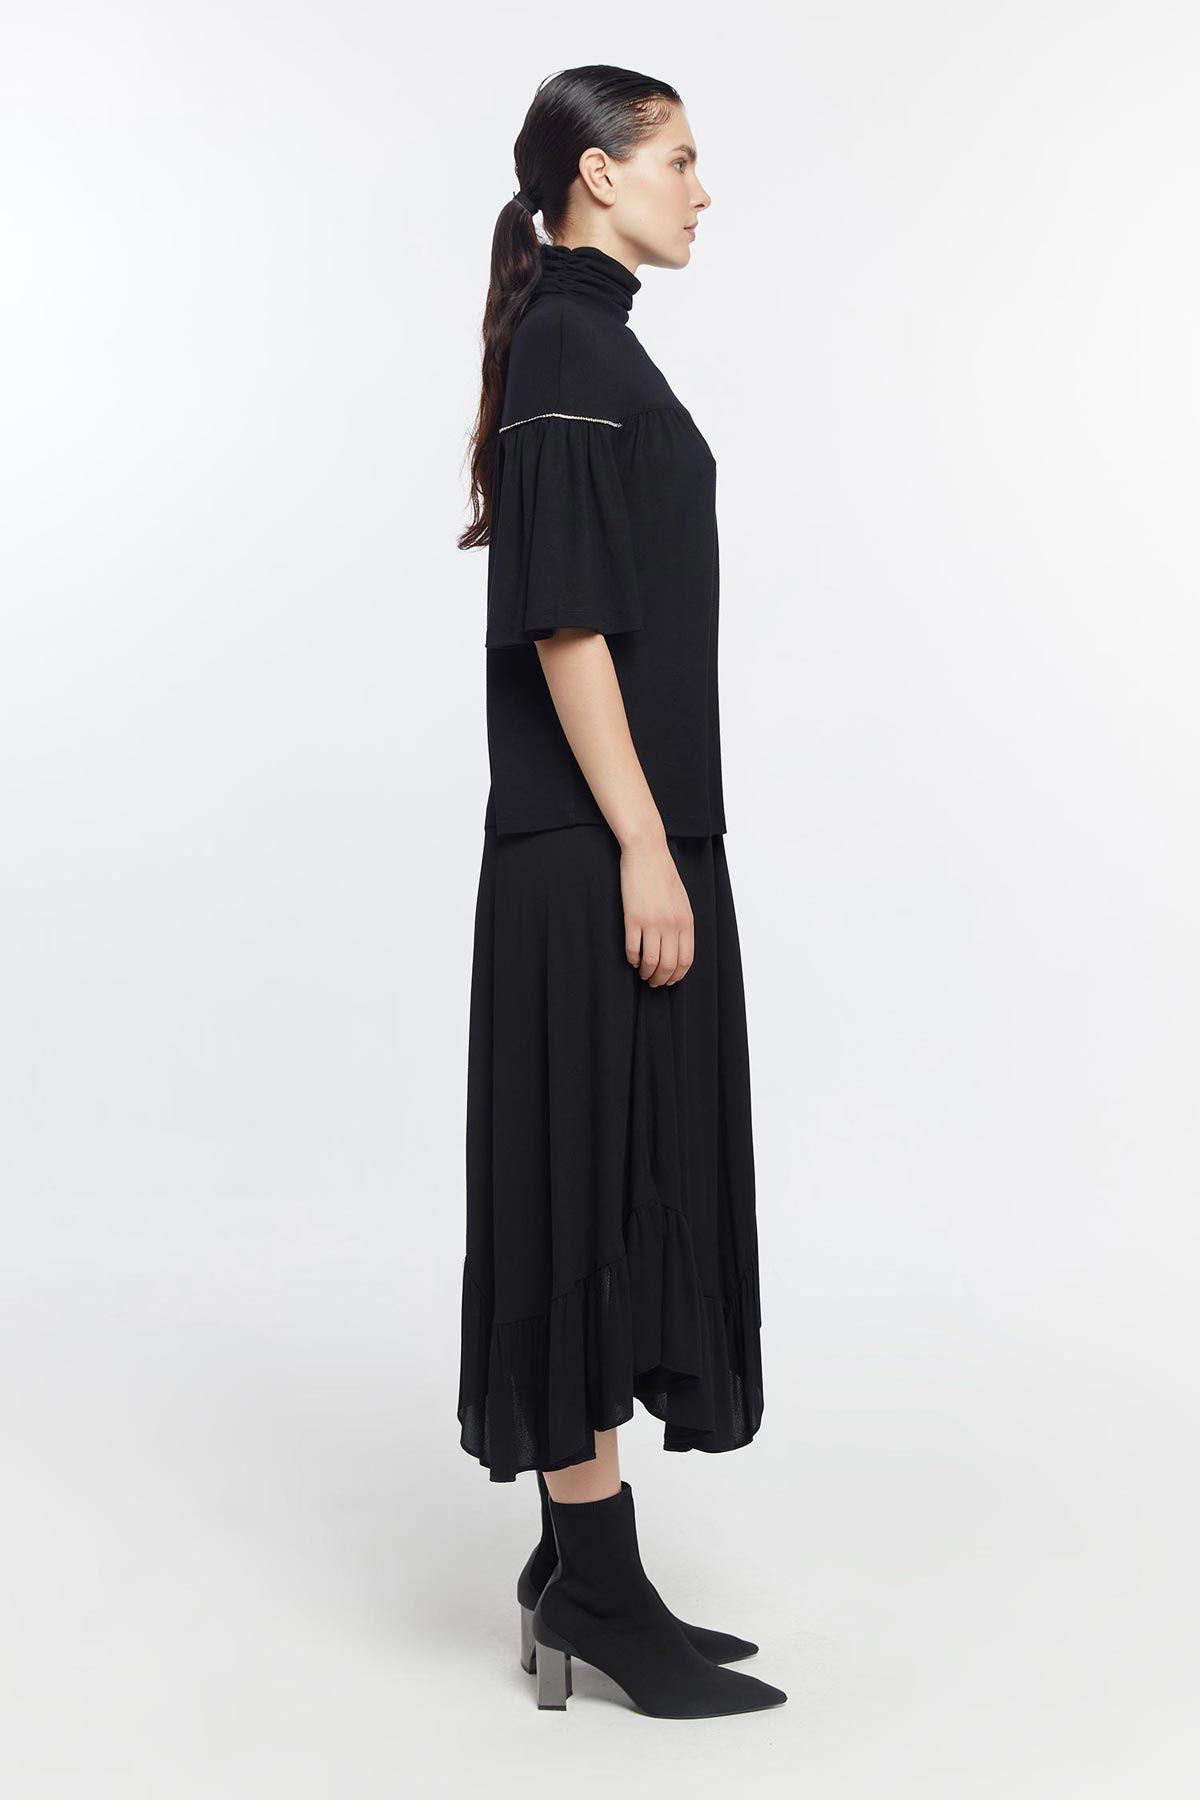 Taş şerit geçmeli büzgülü bluz Siyah